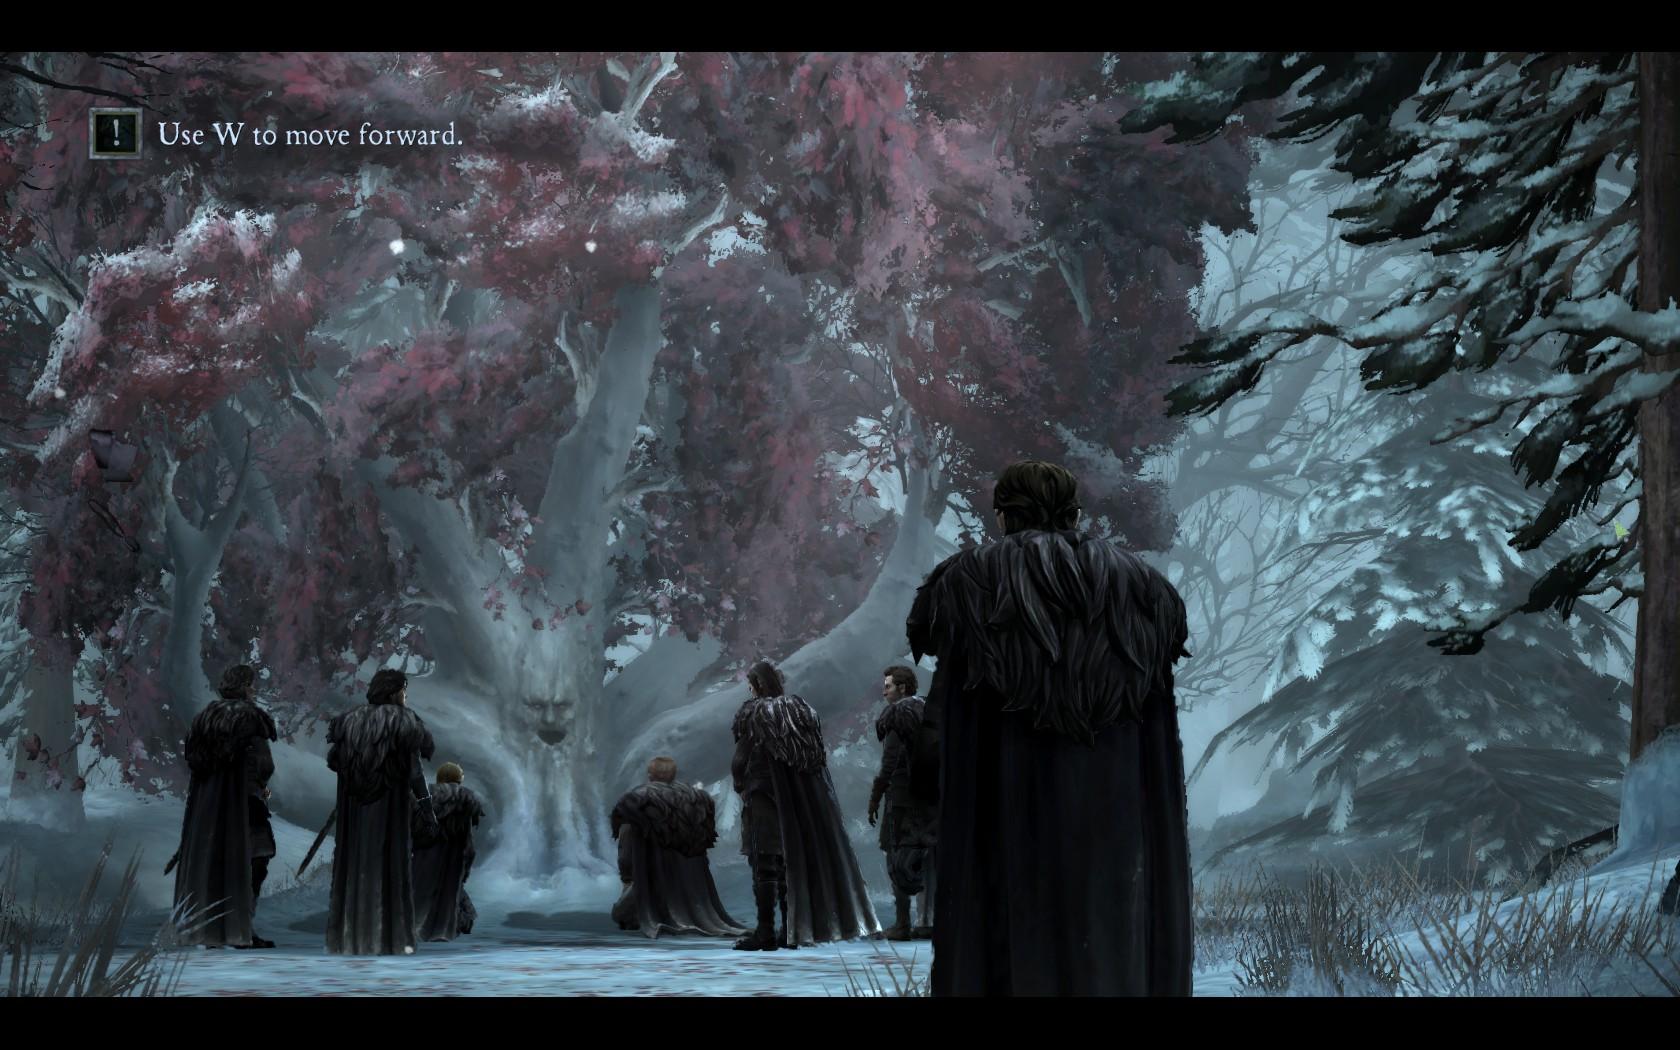 Game of Thrones: The Sword in the Darkness - ve stínu dračích křídel 107313